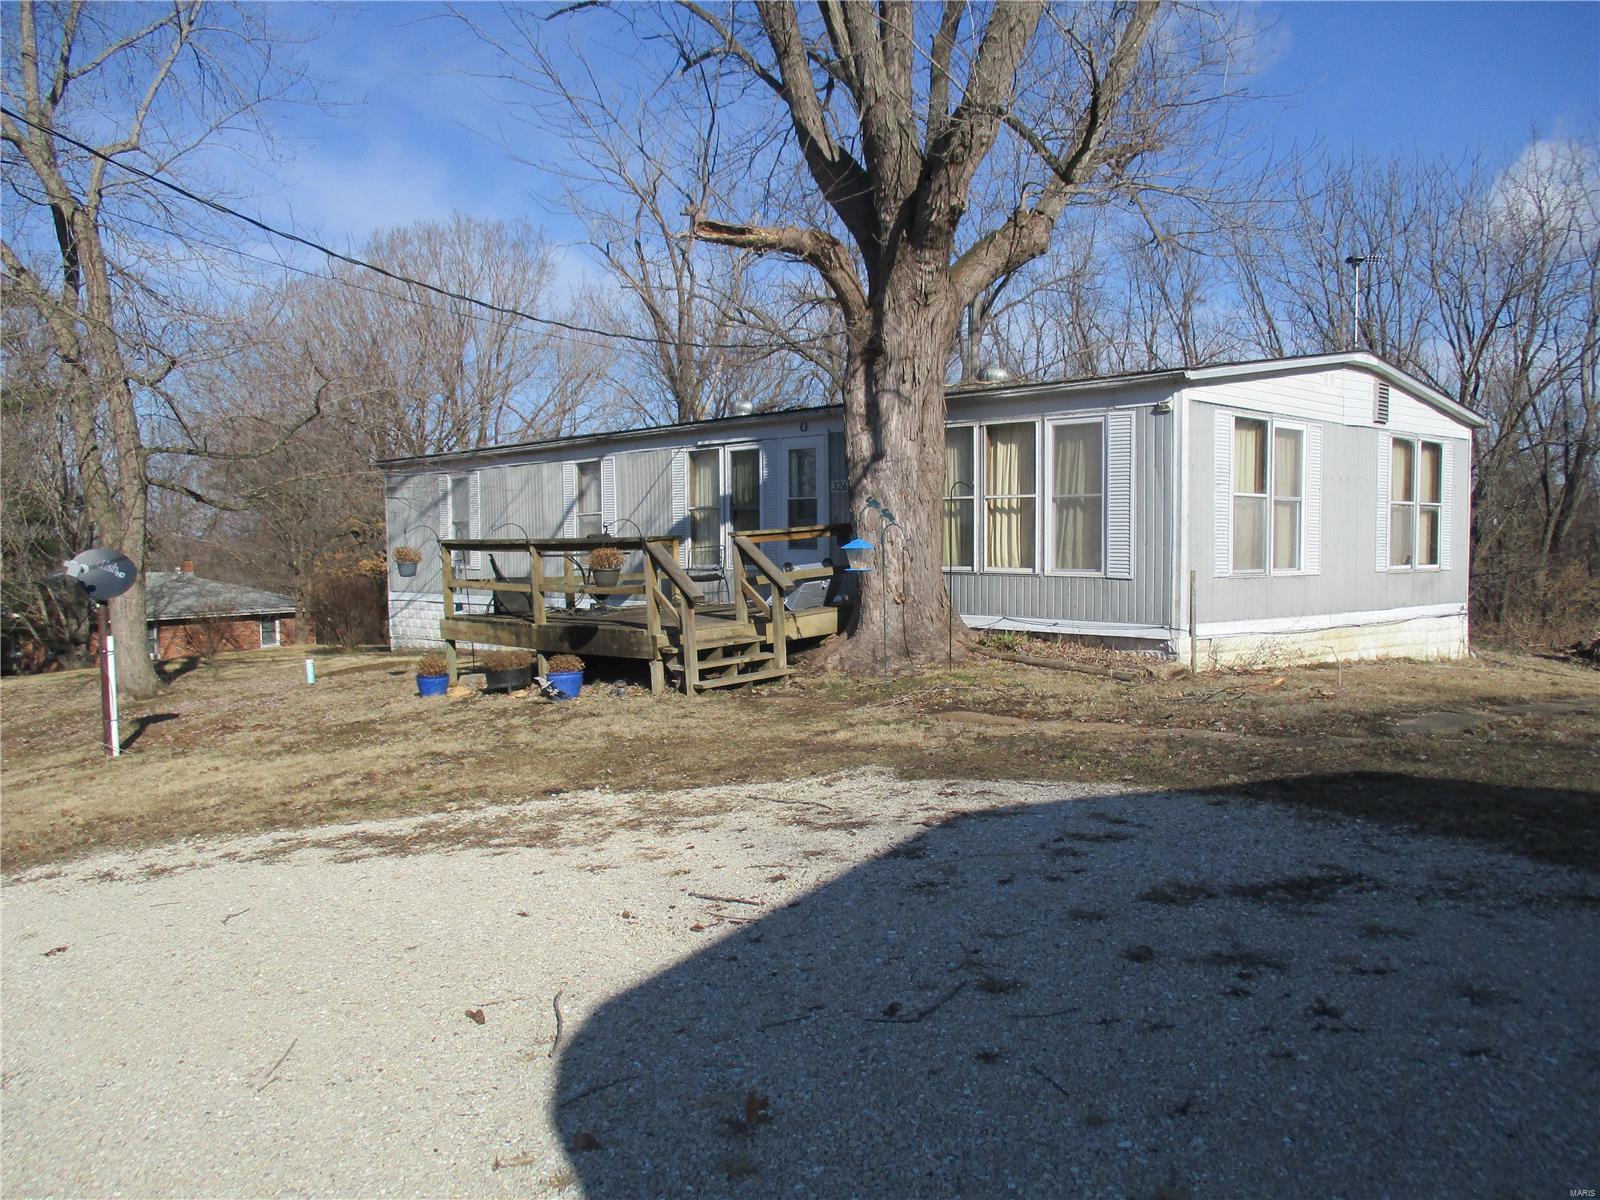 326 Main Property Photo - Morrison, MO real estate listing